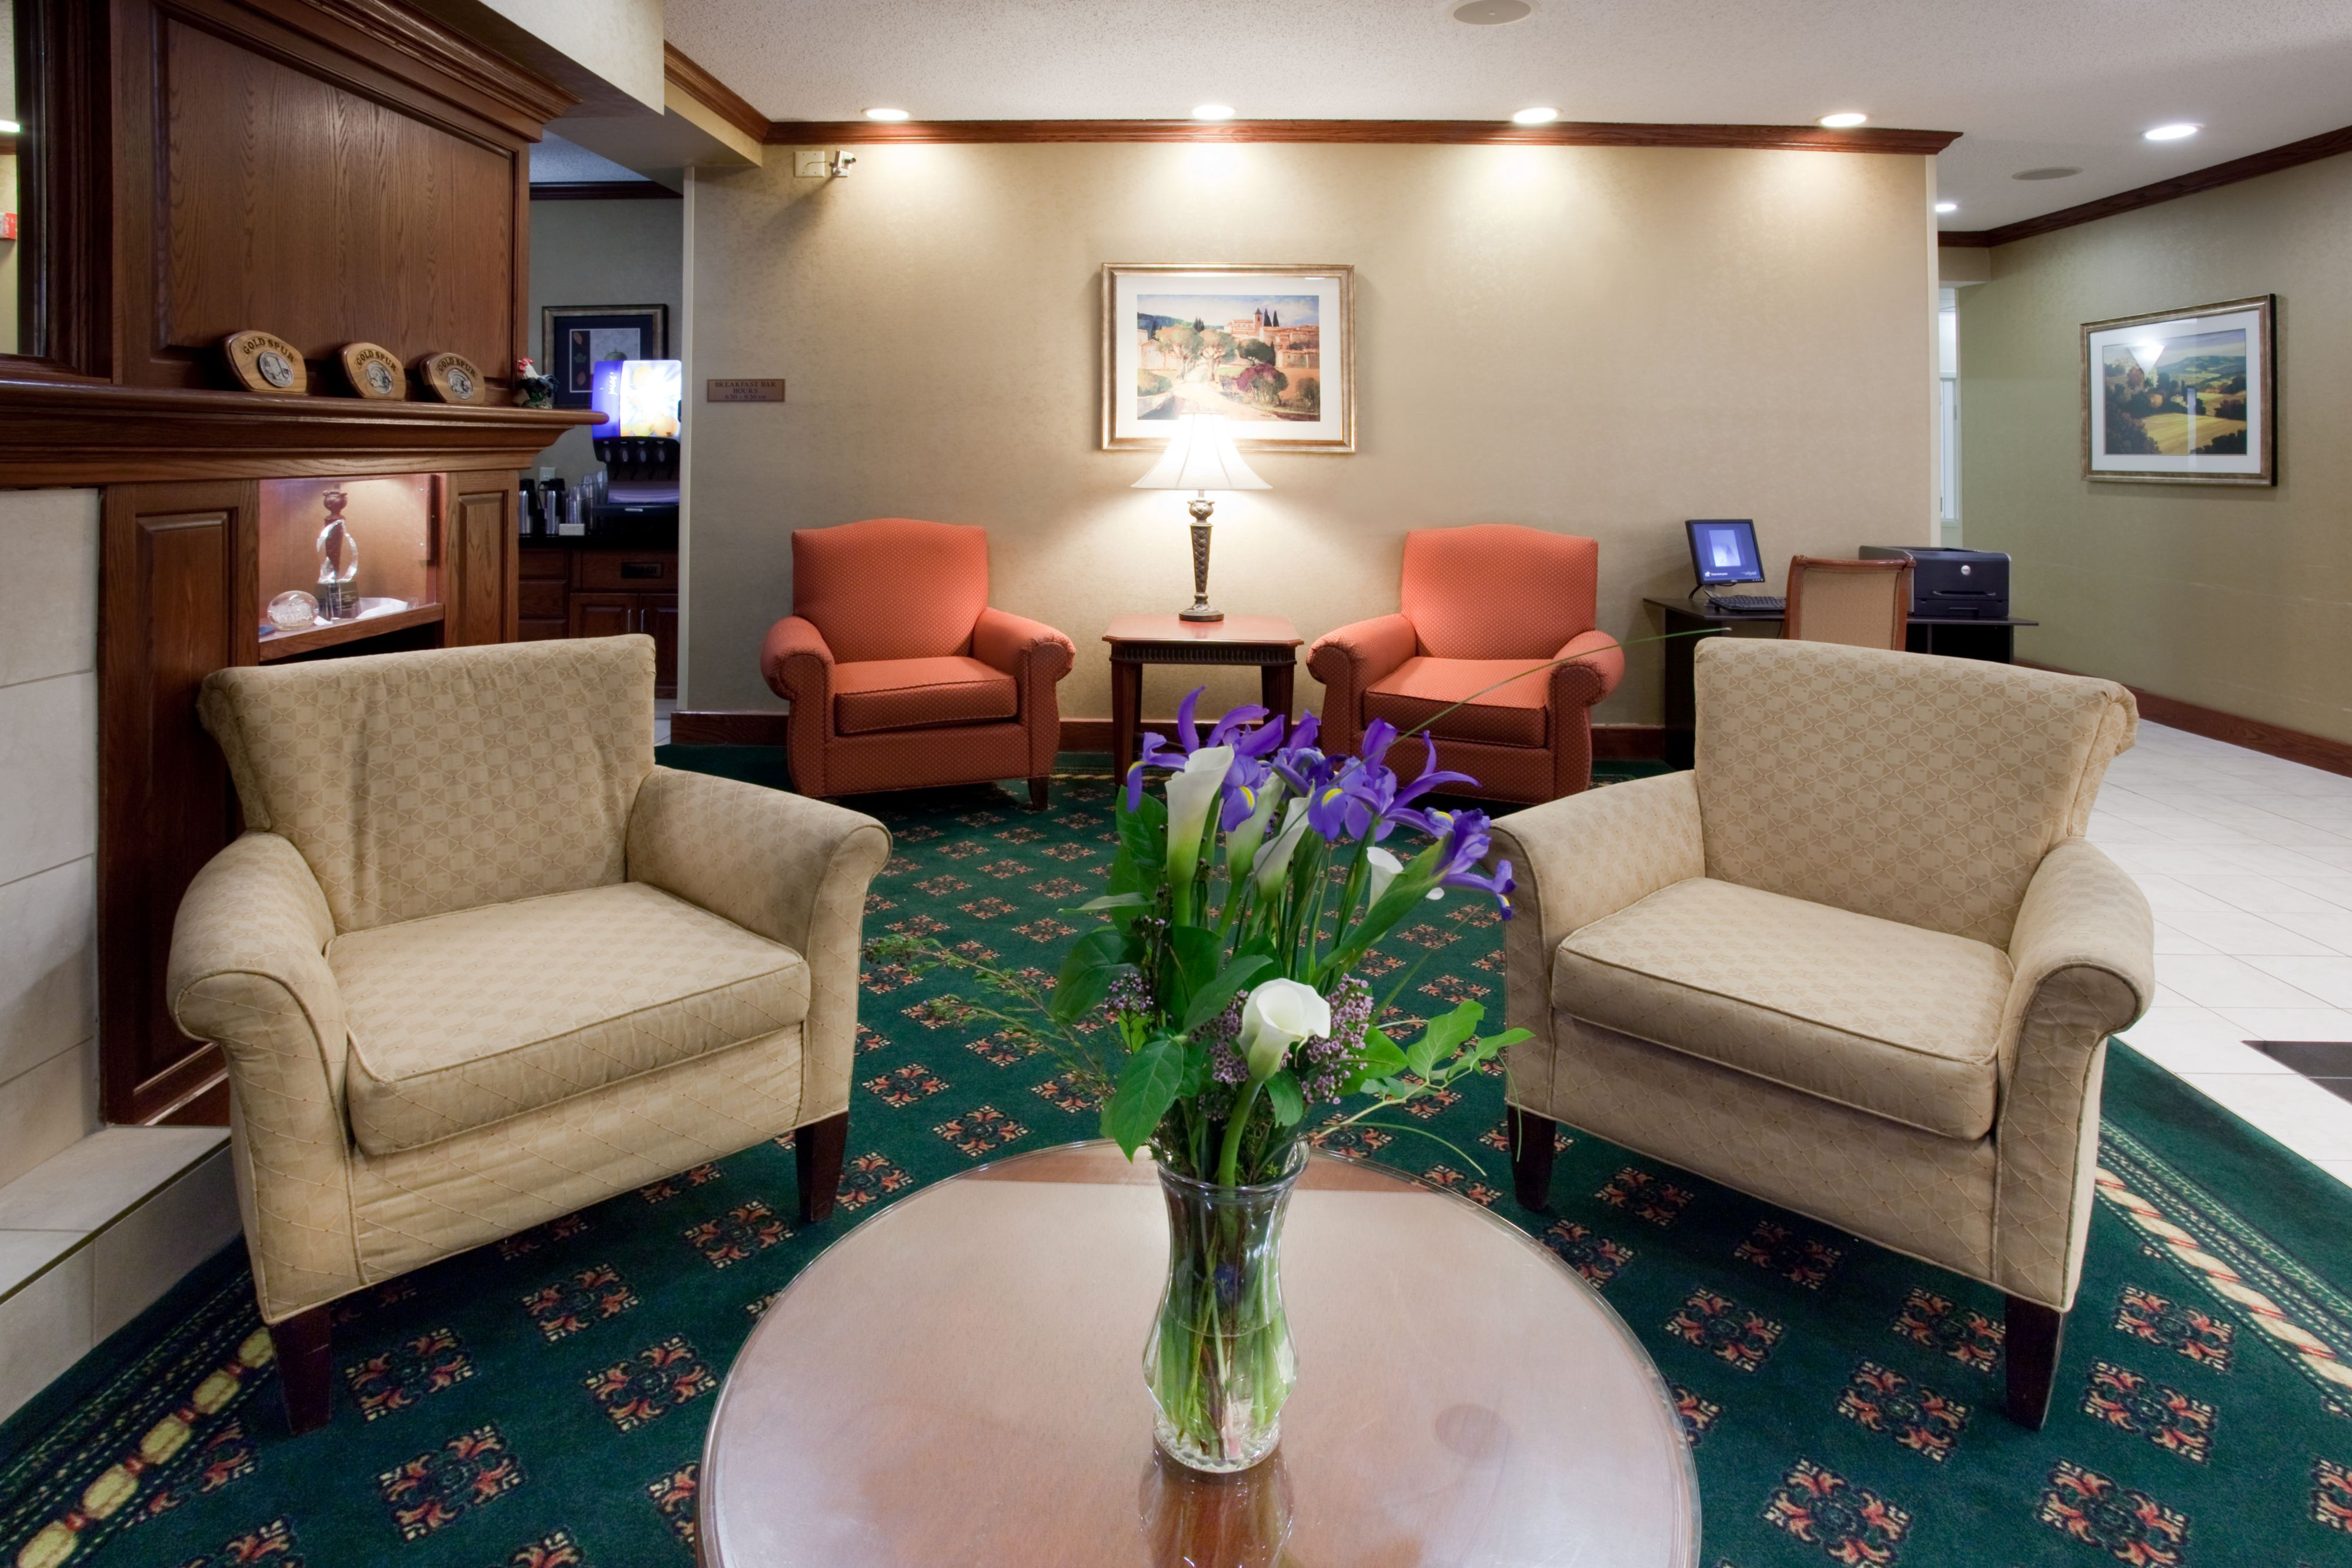 Holiday Inn Express Greeley image 4